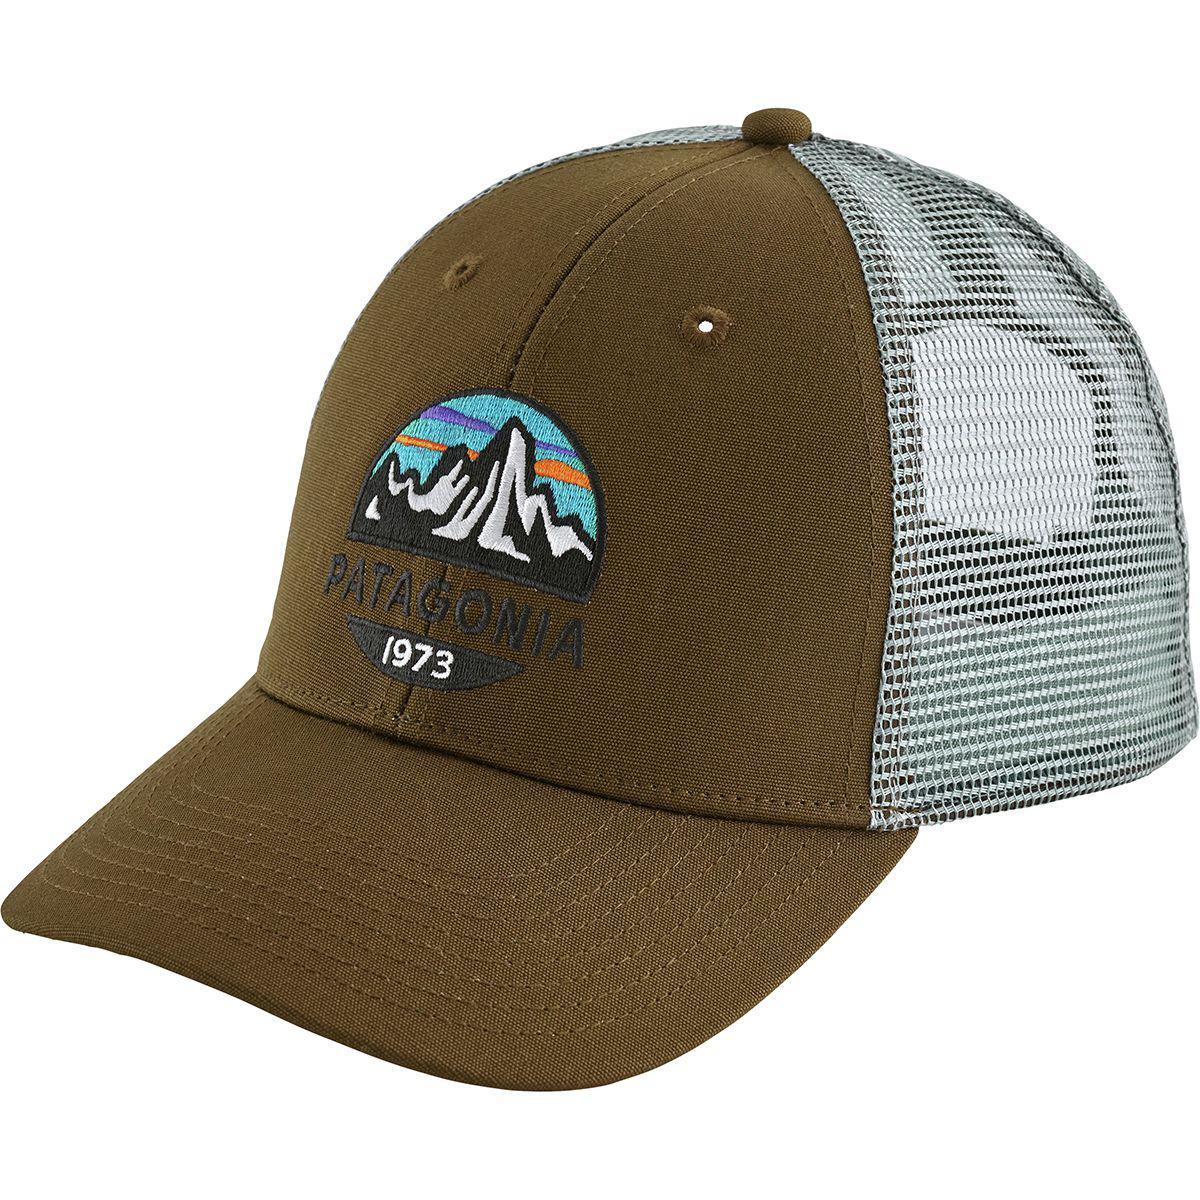 82b1120d43665 Lyst - Patagonia Fitz Roy Scope Lopro Trucker Hat in Green for Men